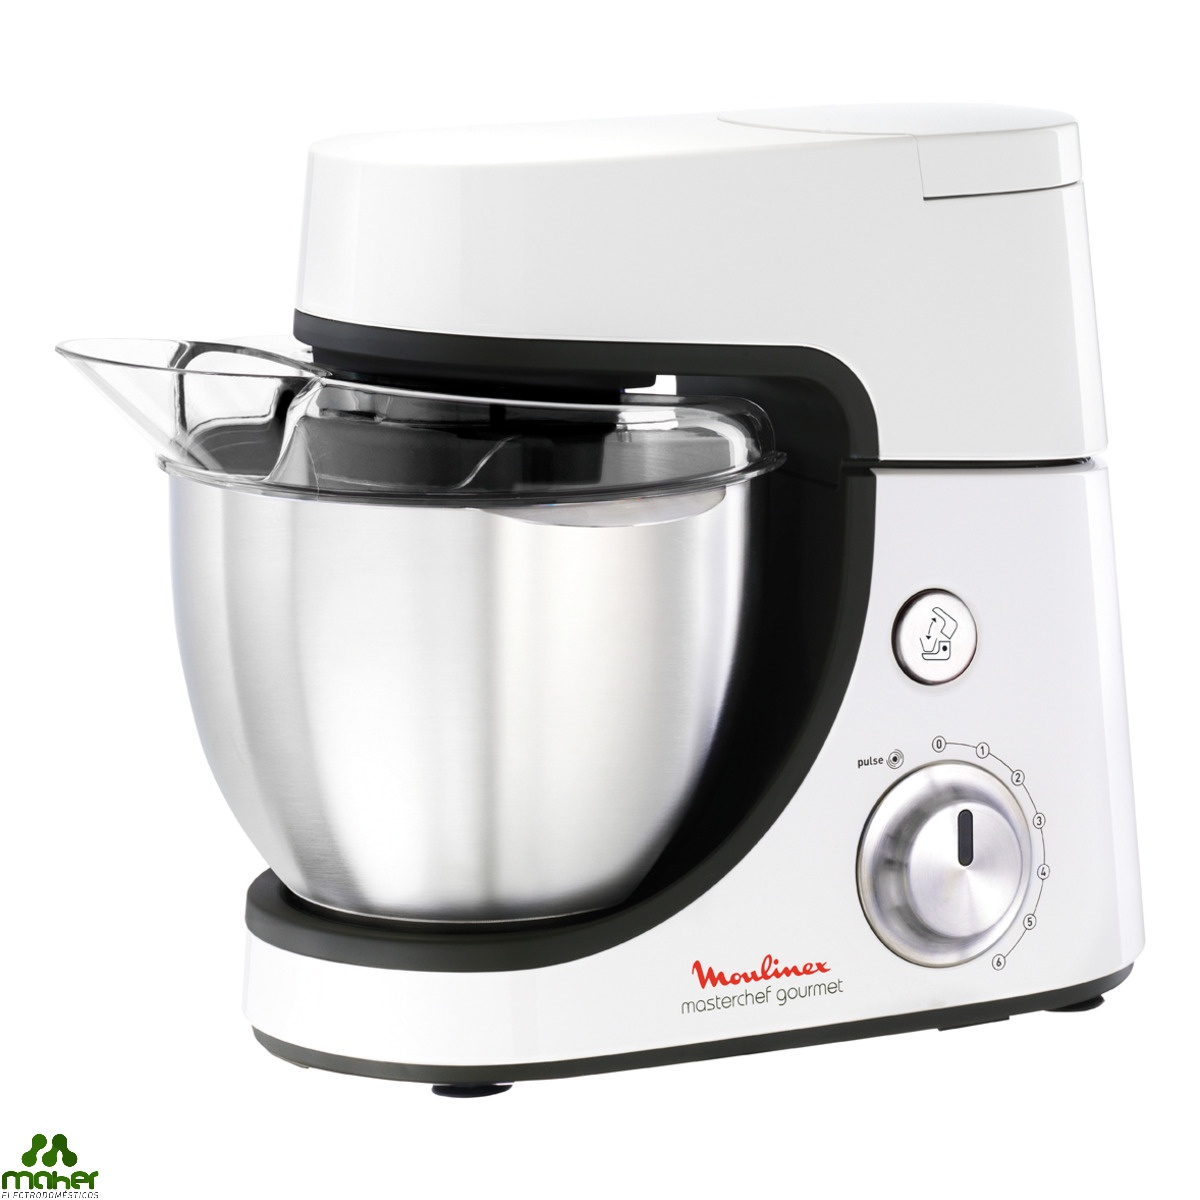 Robot de cocina mastercheff gourmet moulinex qa5081b - Robot de cocina gourmet ...